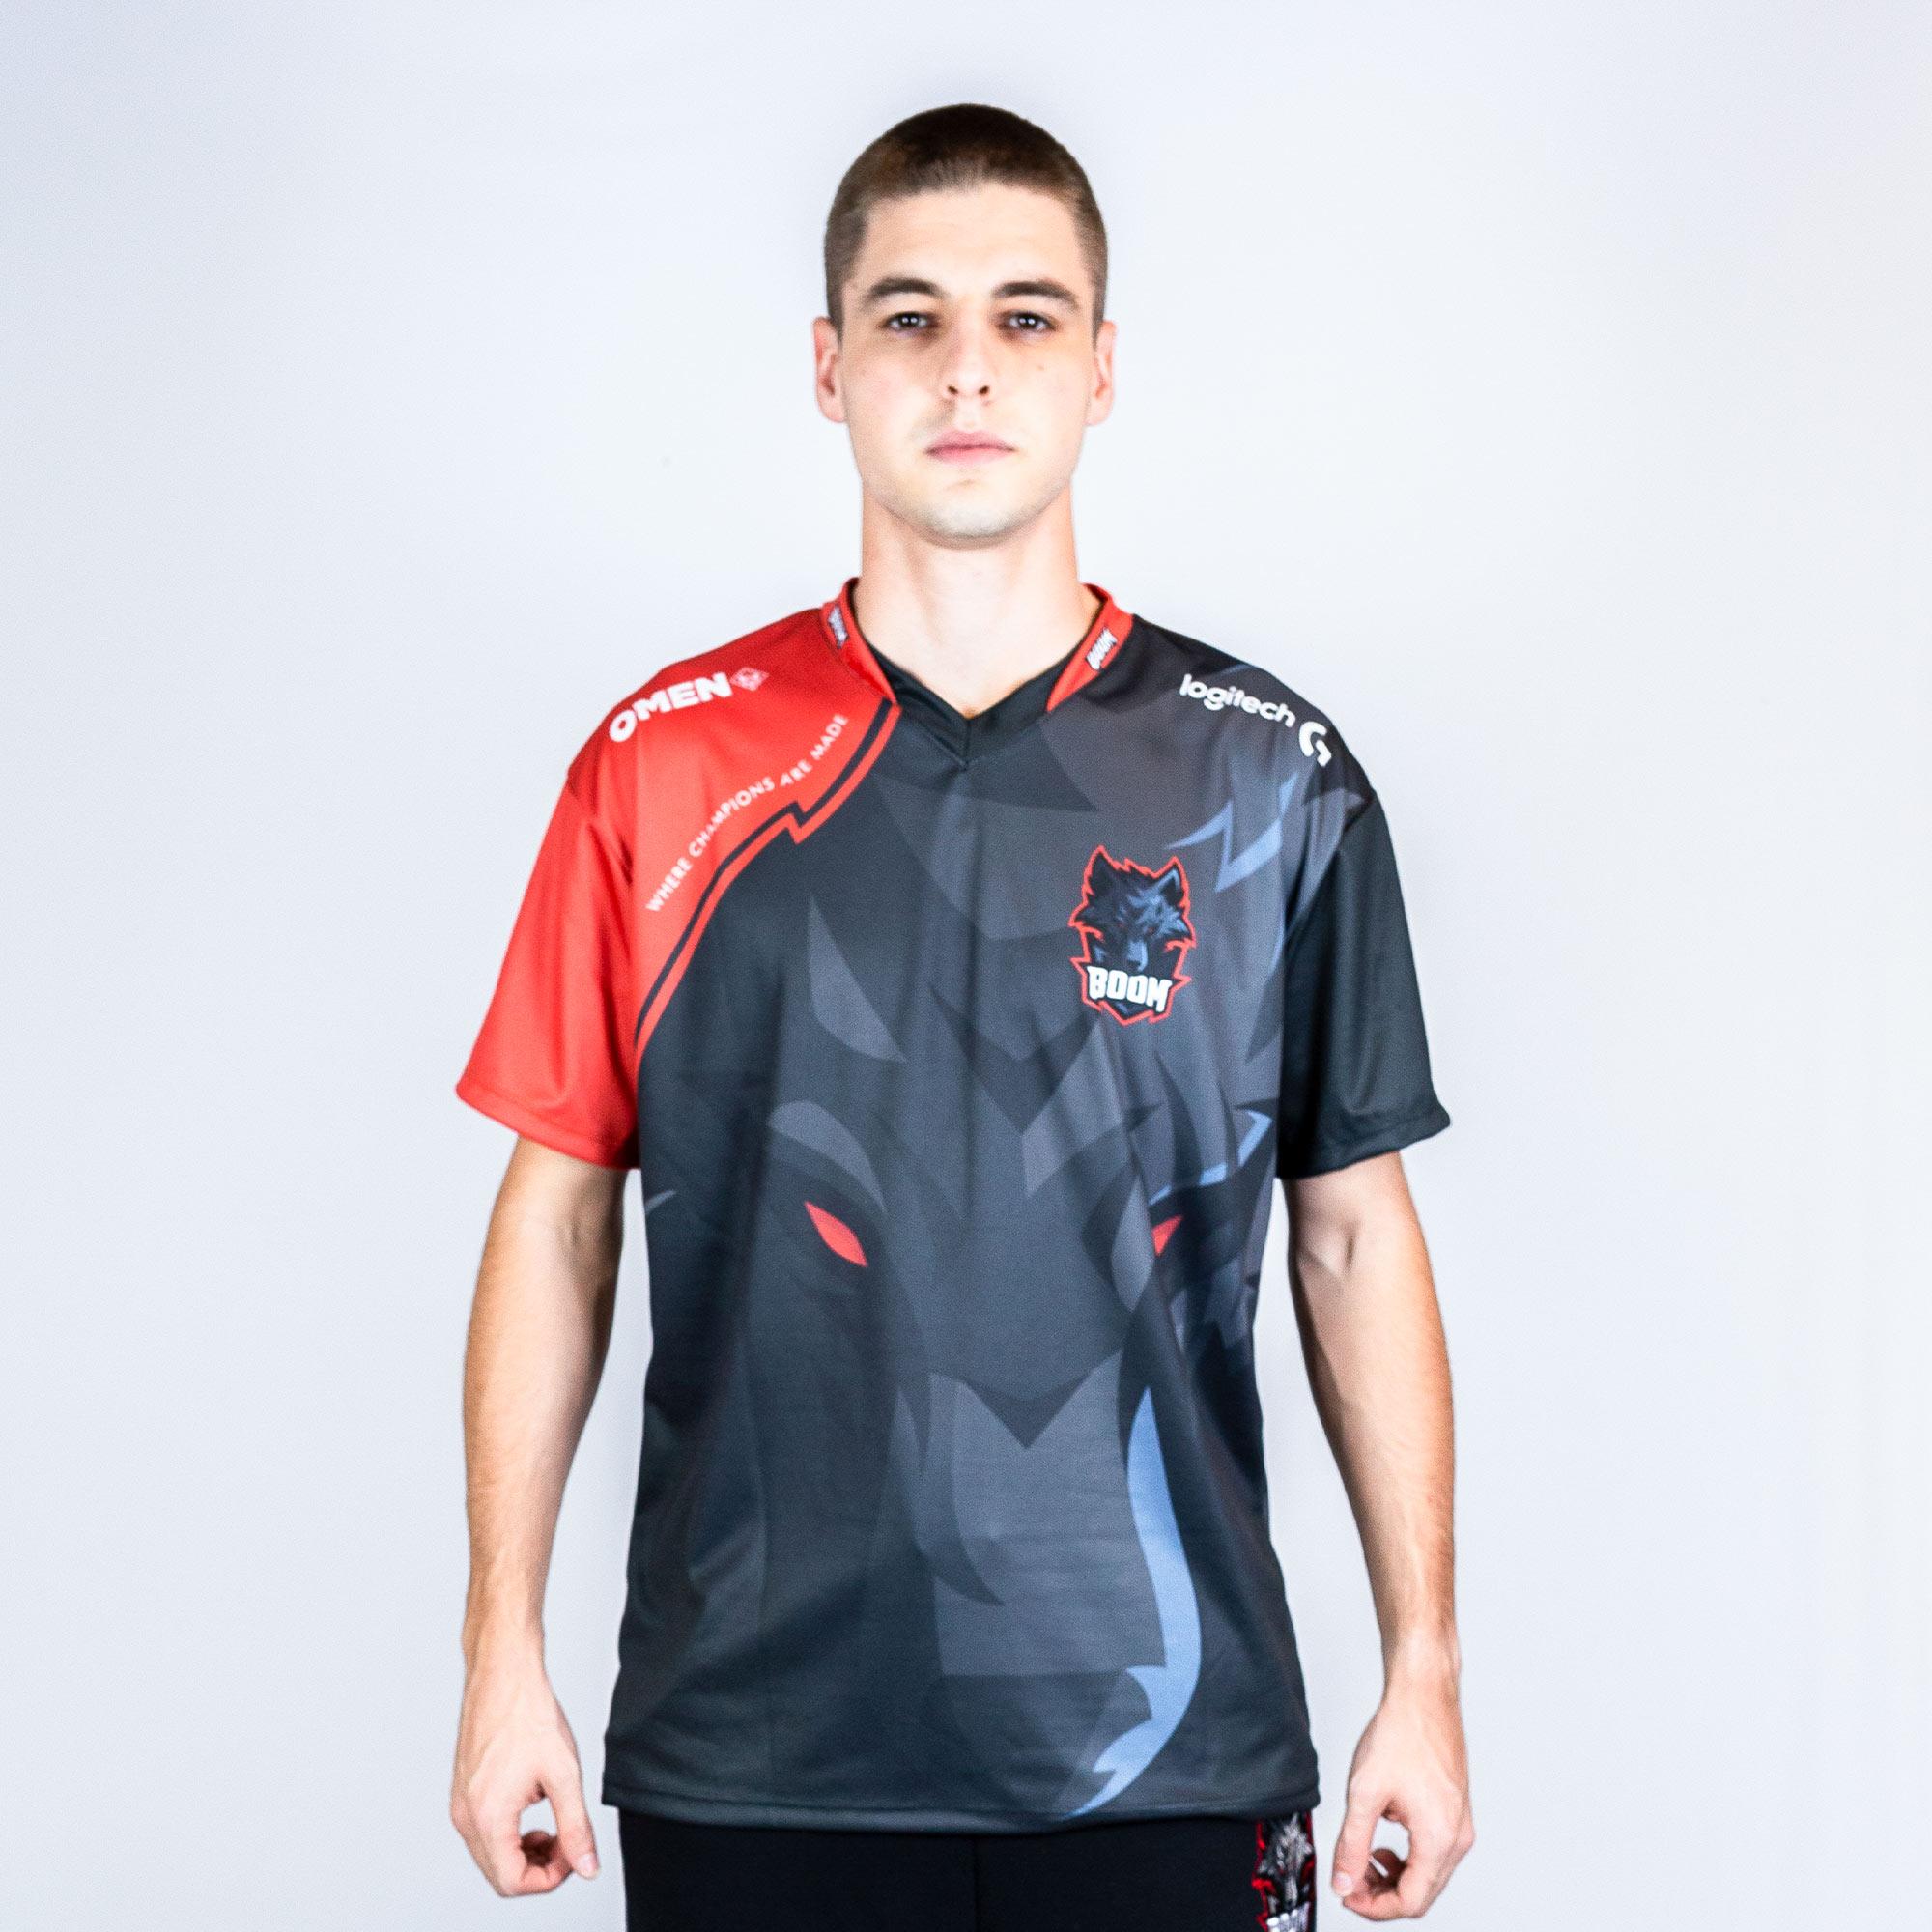 Camiseta Jersey Boom Esports Oficial